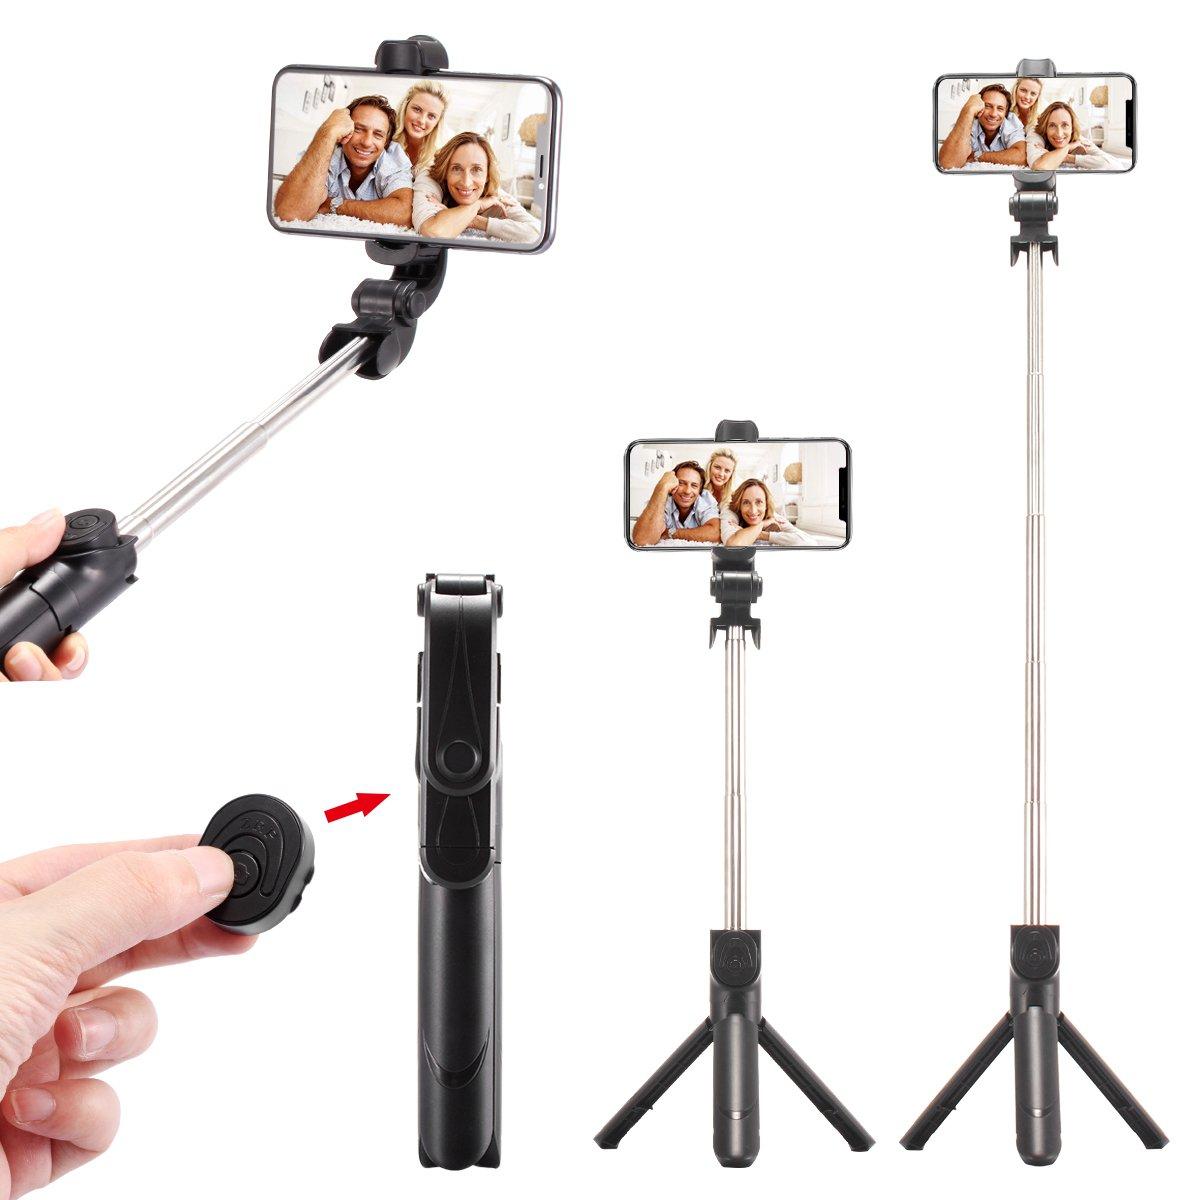 WONGYEAH Bluetooth Selfie Stick Tripod Extendable Selfie Stick with Wireless Remote for iPhone X/8/8 Plus/7/7 Plus/6S/Galaxy S9/S9 Plus/Note 8/S8 /S8 Plus/Google Pixel & More (Black)